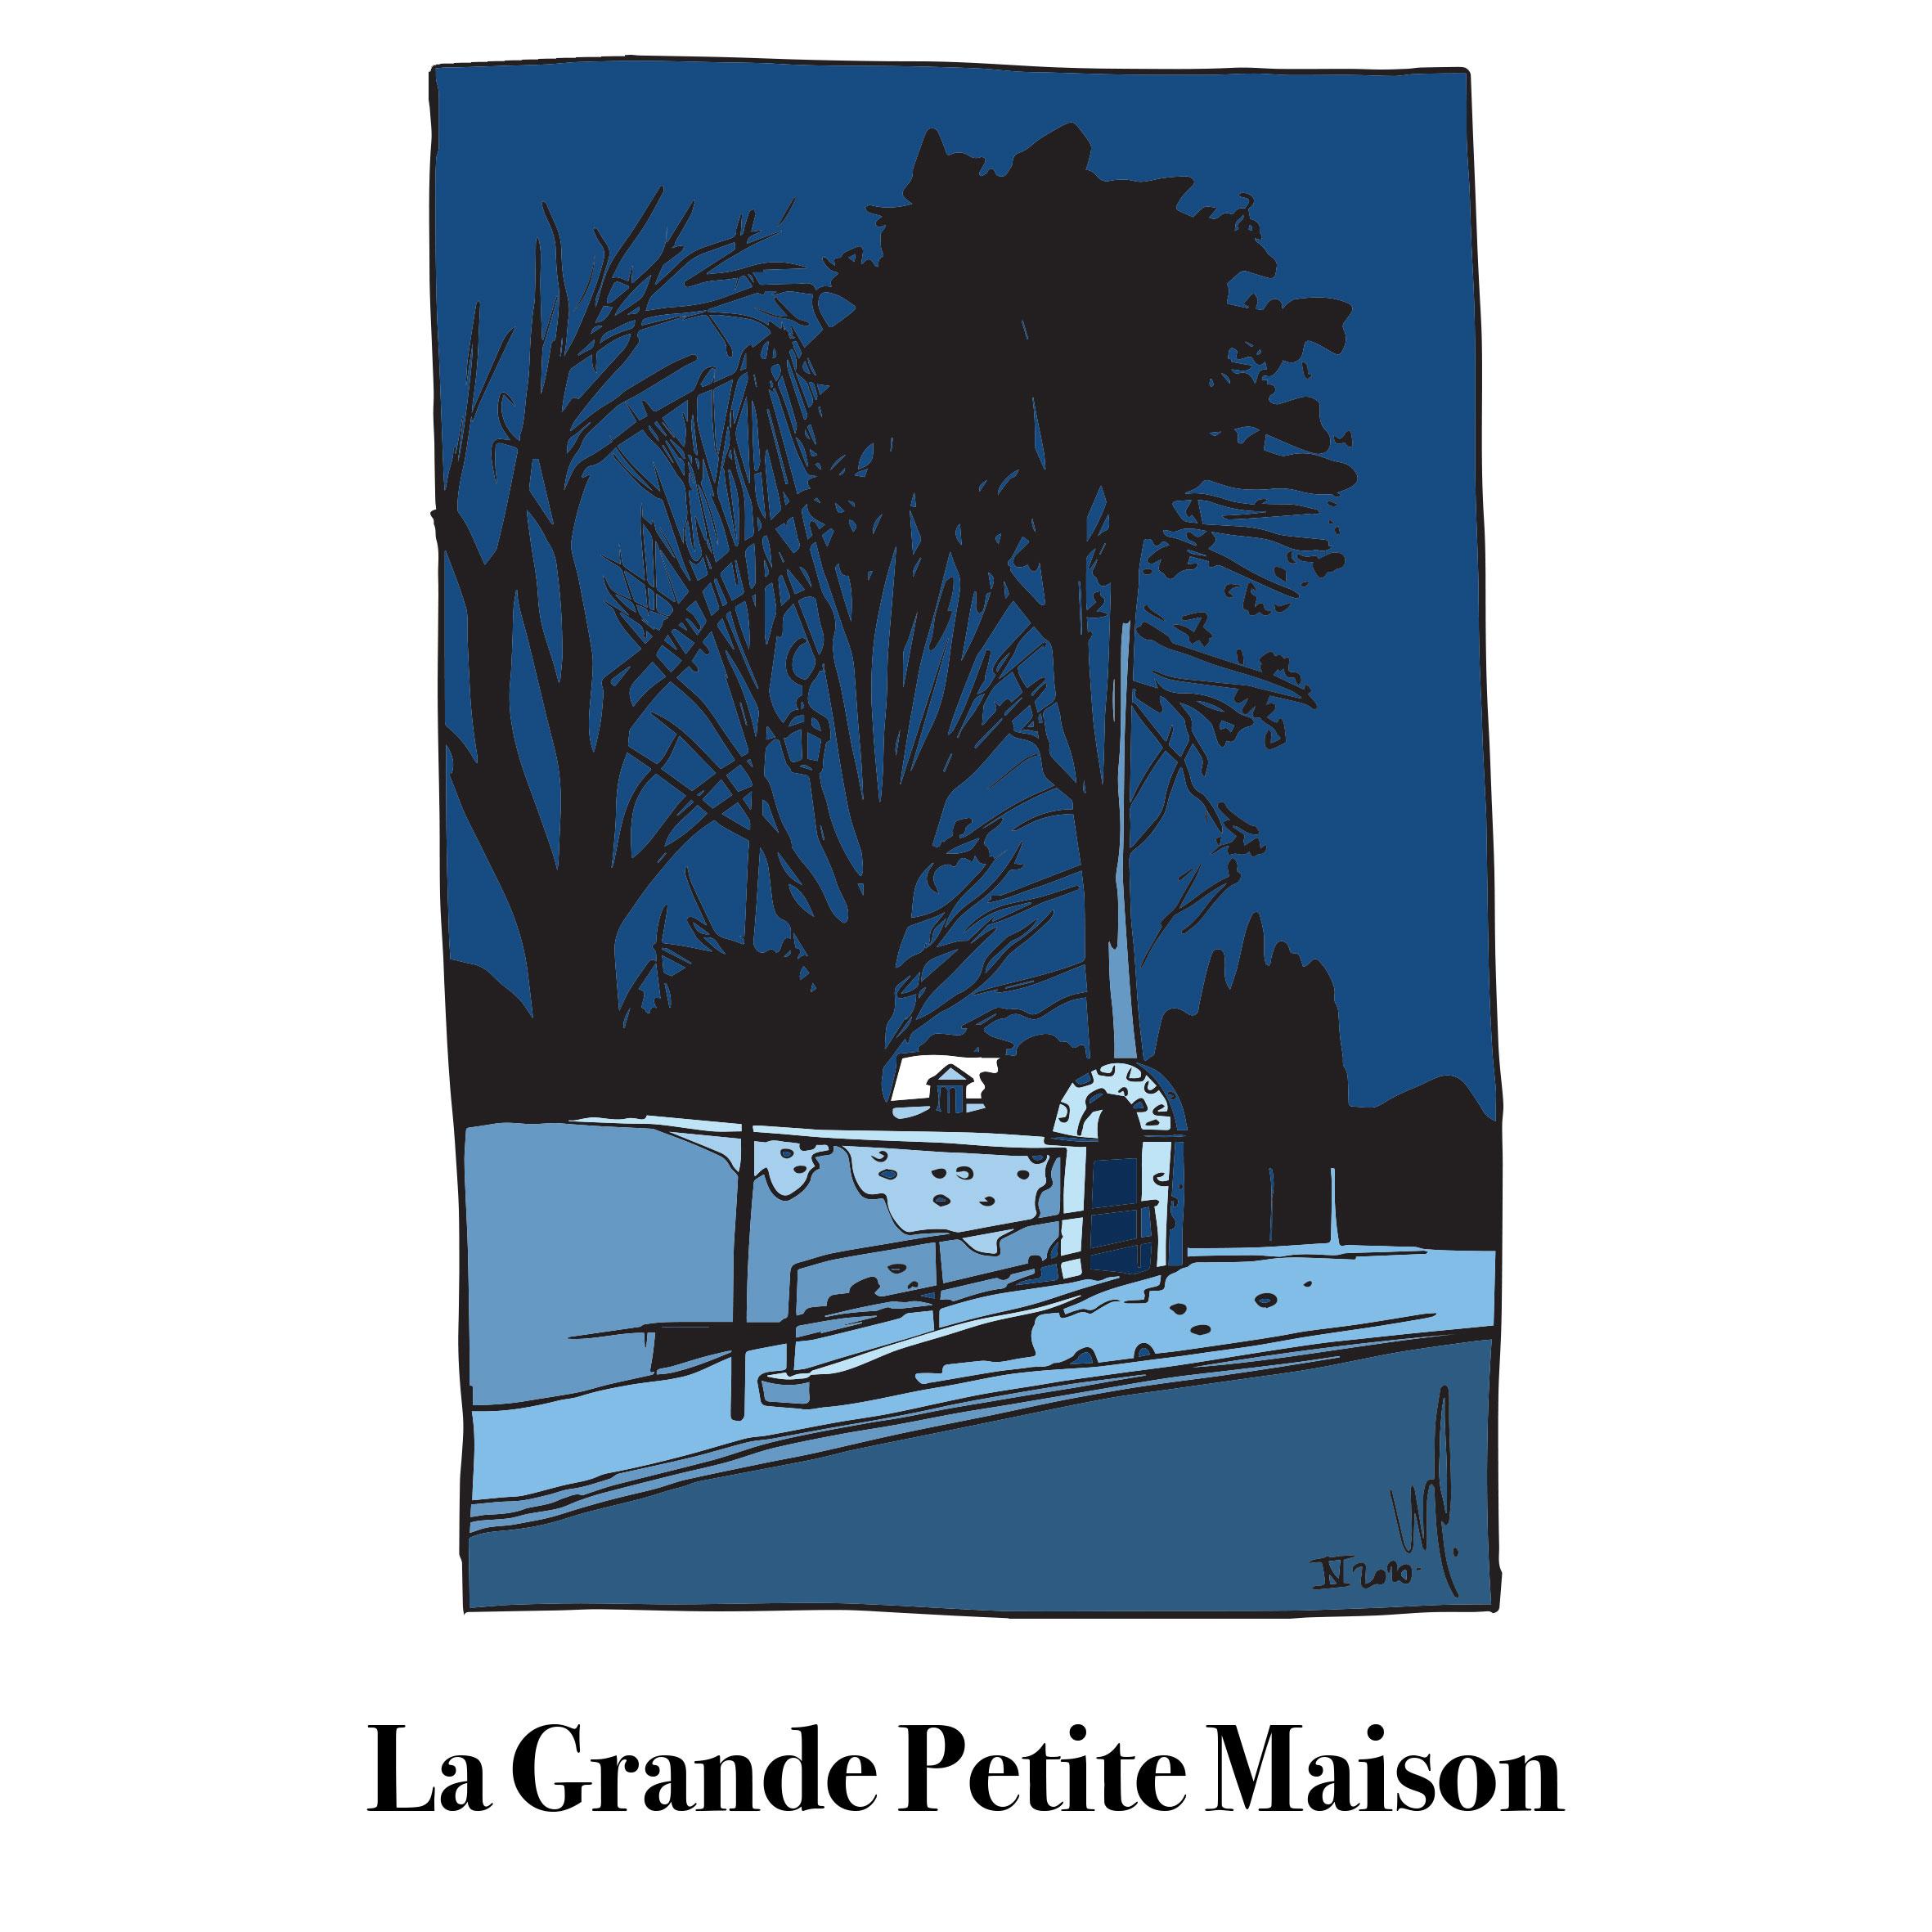 LA_GRANDE_PETITE_MAISON